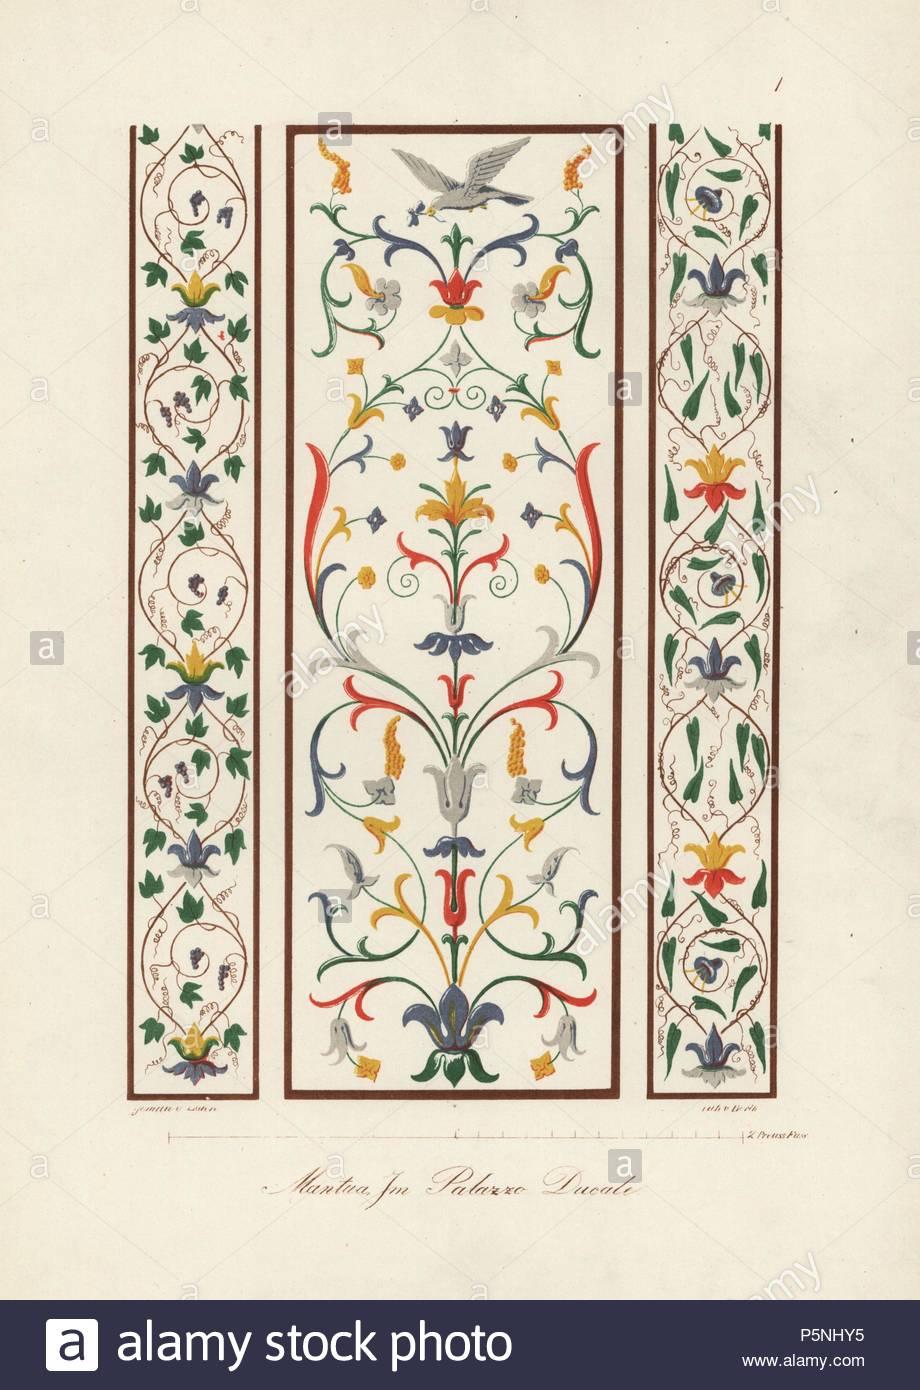 Medieval Mosaics Stockfotos & Medieval Mosaics Bilder - Alamy